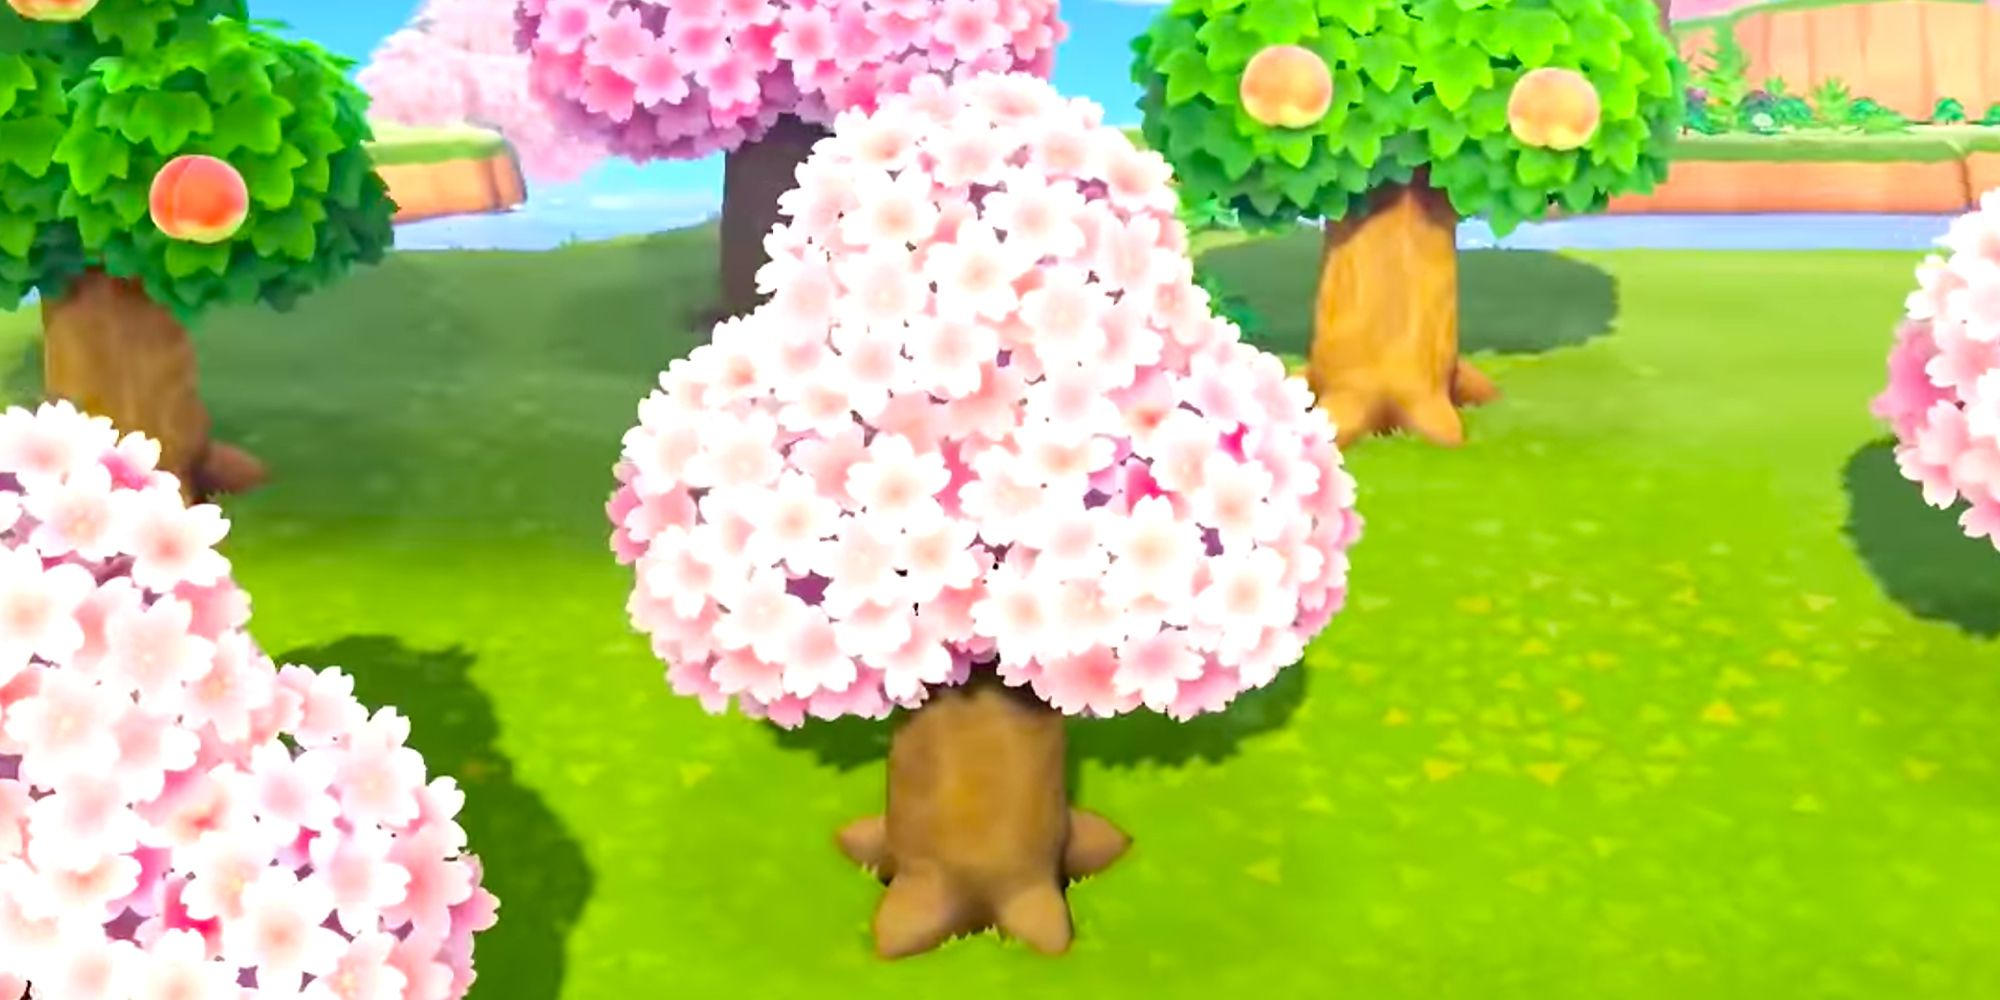 Animal Crossing Every Cherry Blossom Diy Recipe April 2021 Informone